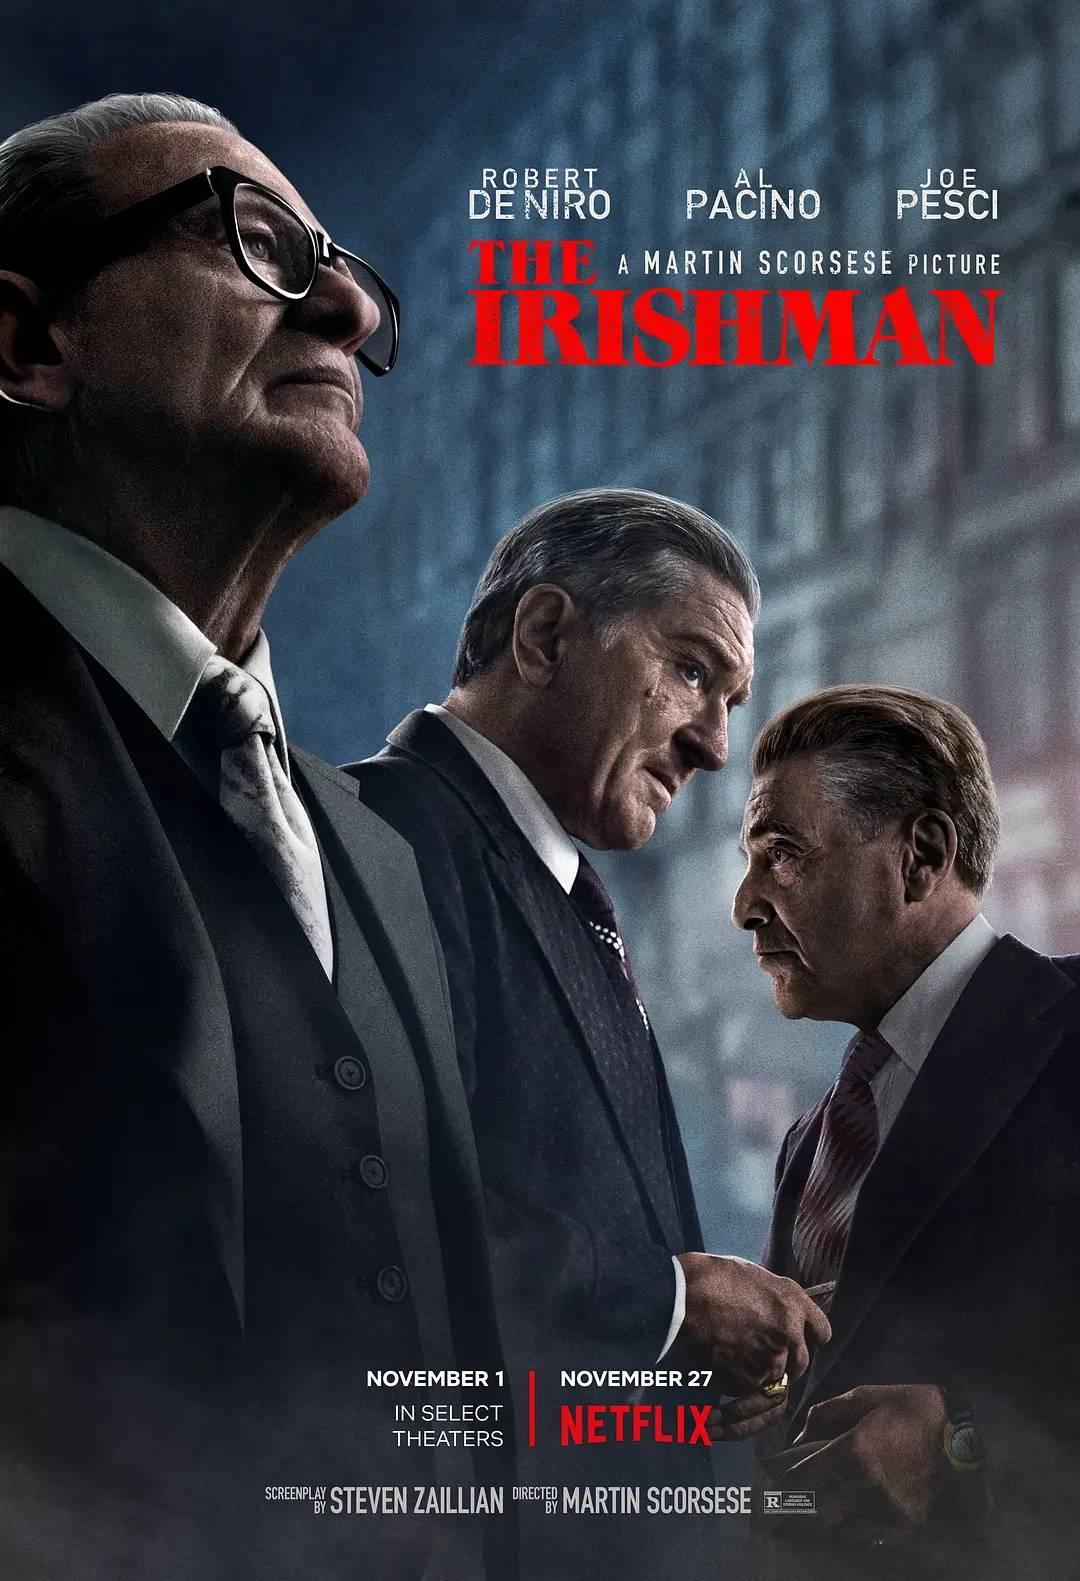 The Irishman (2019) Hindi WEB-DL 480p 720p 1080p Dual Audio [हिंदी DD5.1 + English] ESubs | Full Movie